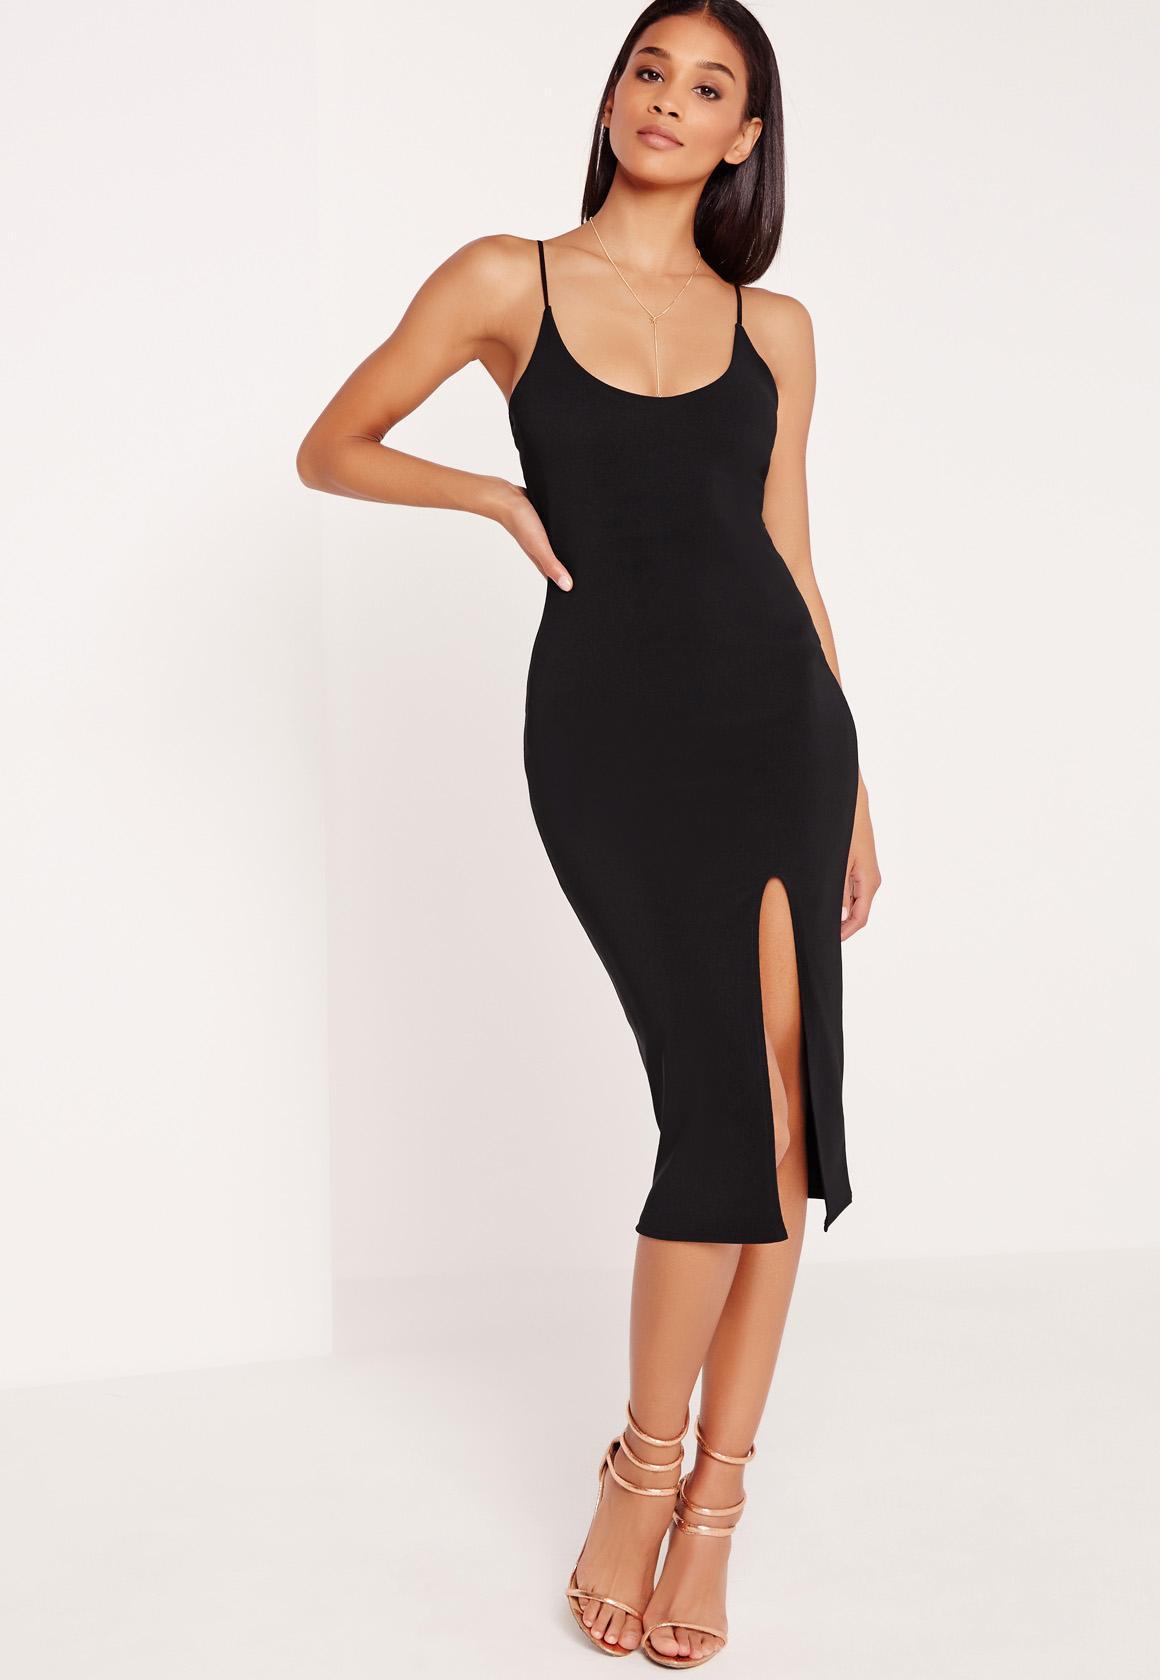 b722ef1960 Missguided - Strappy Scoop Neck Midi Dress Black - Lyst. View fullscreen